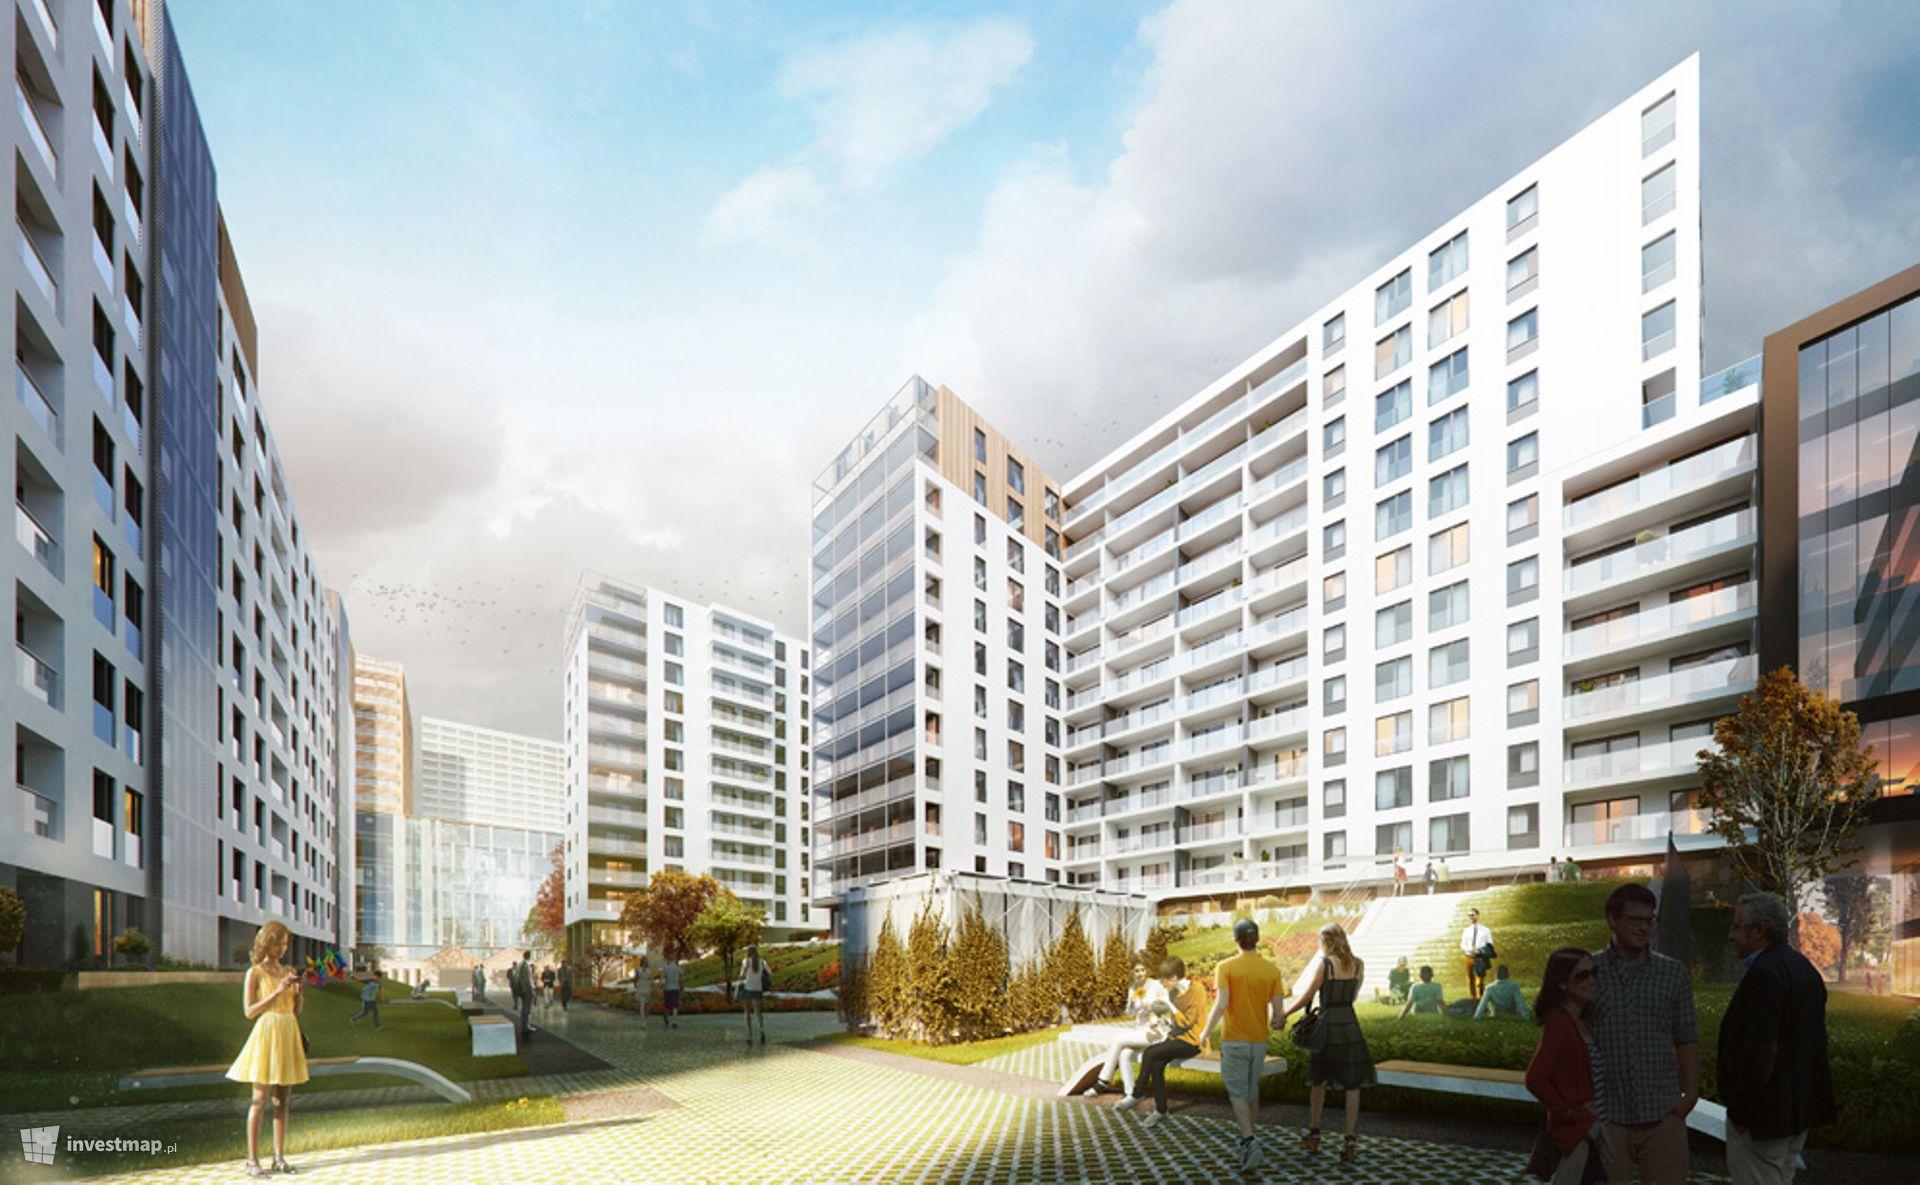 Apartamentowiec Grzybowska 85